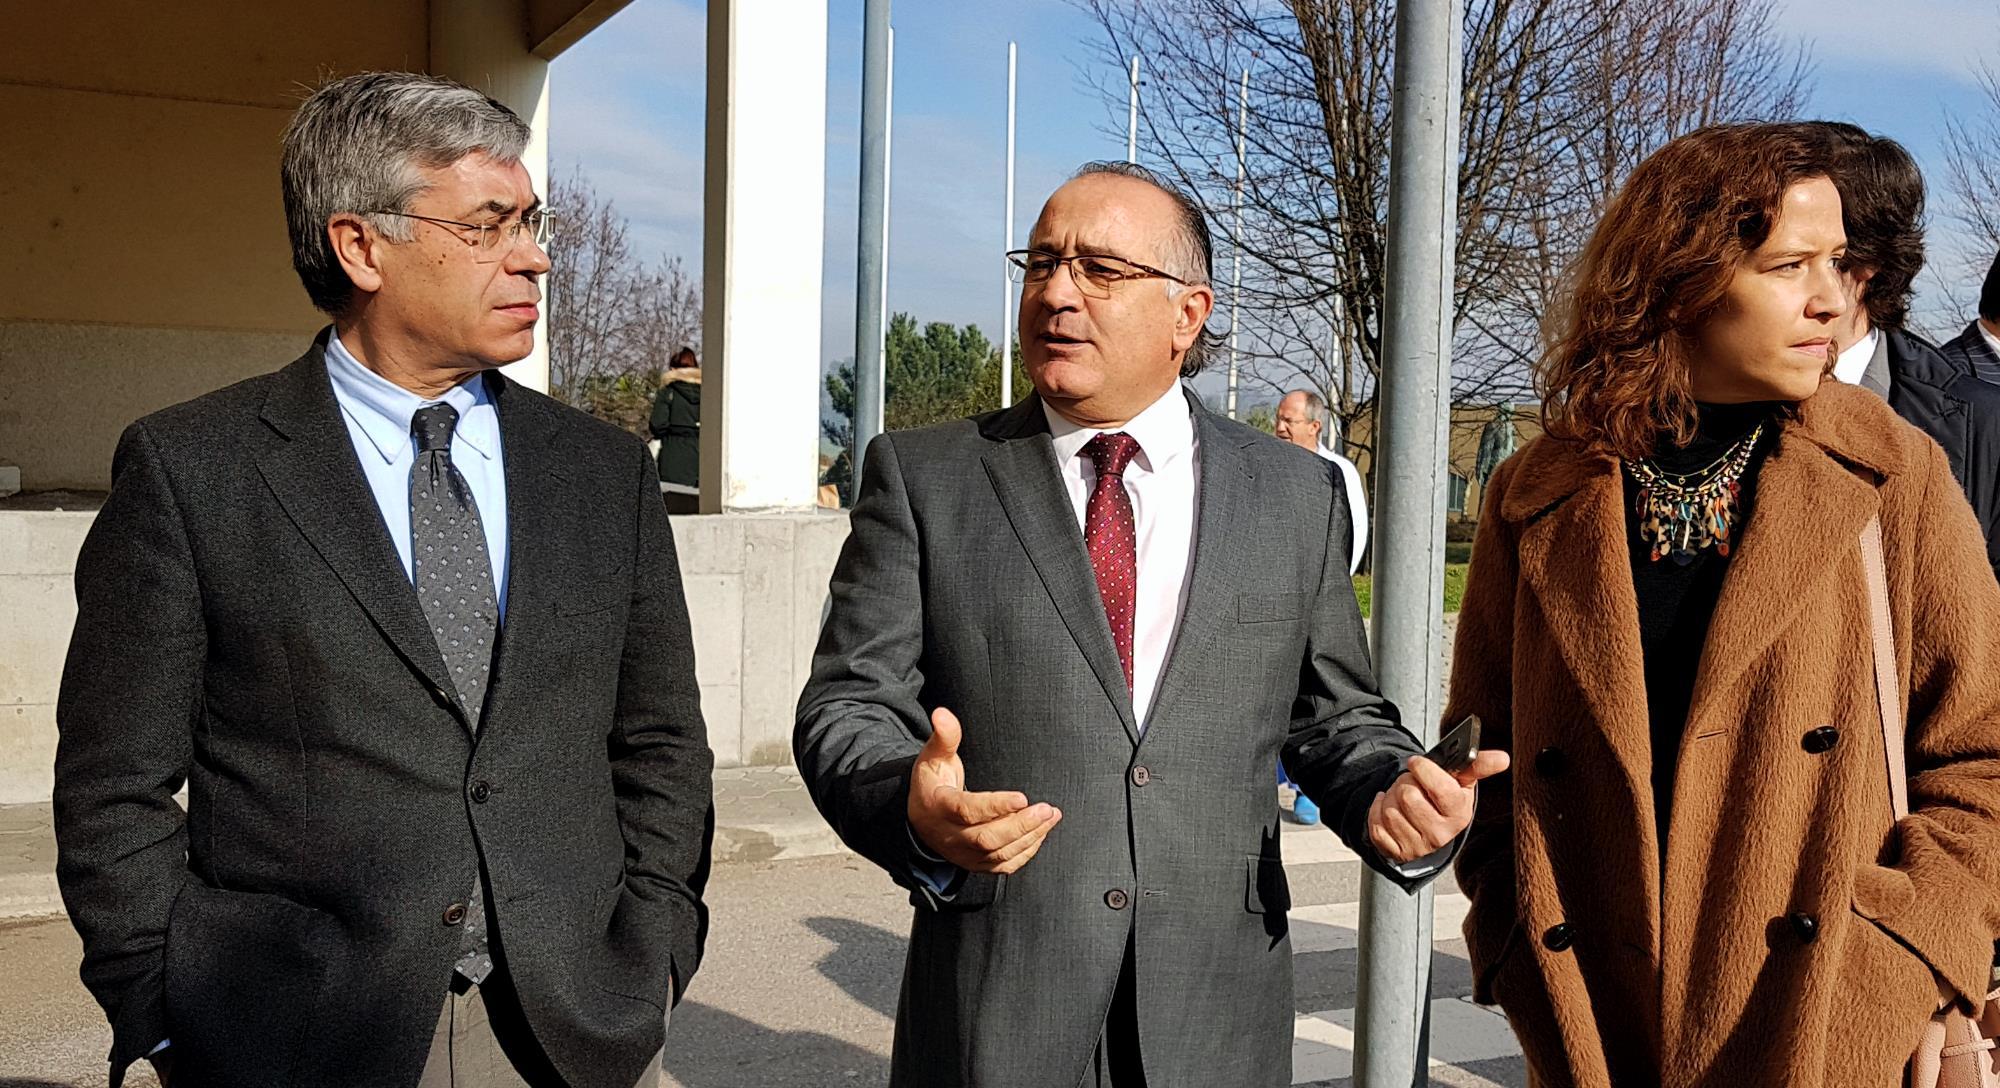 O presidente da ARS-N visitou recentemente o CHTS